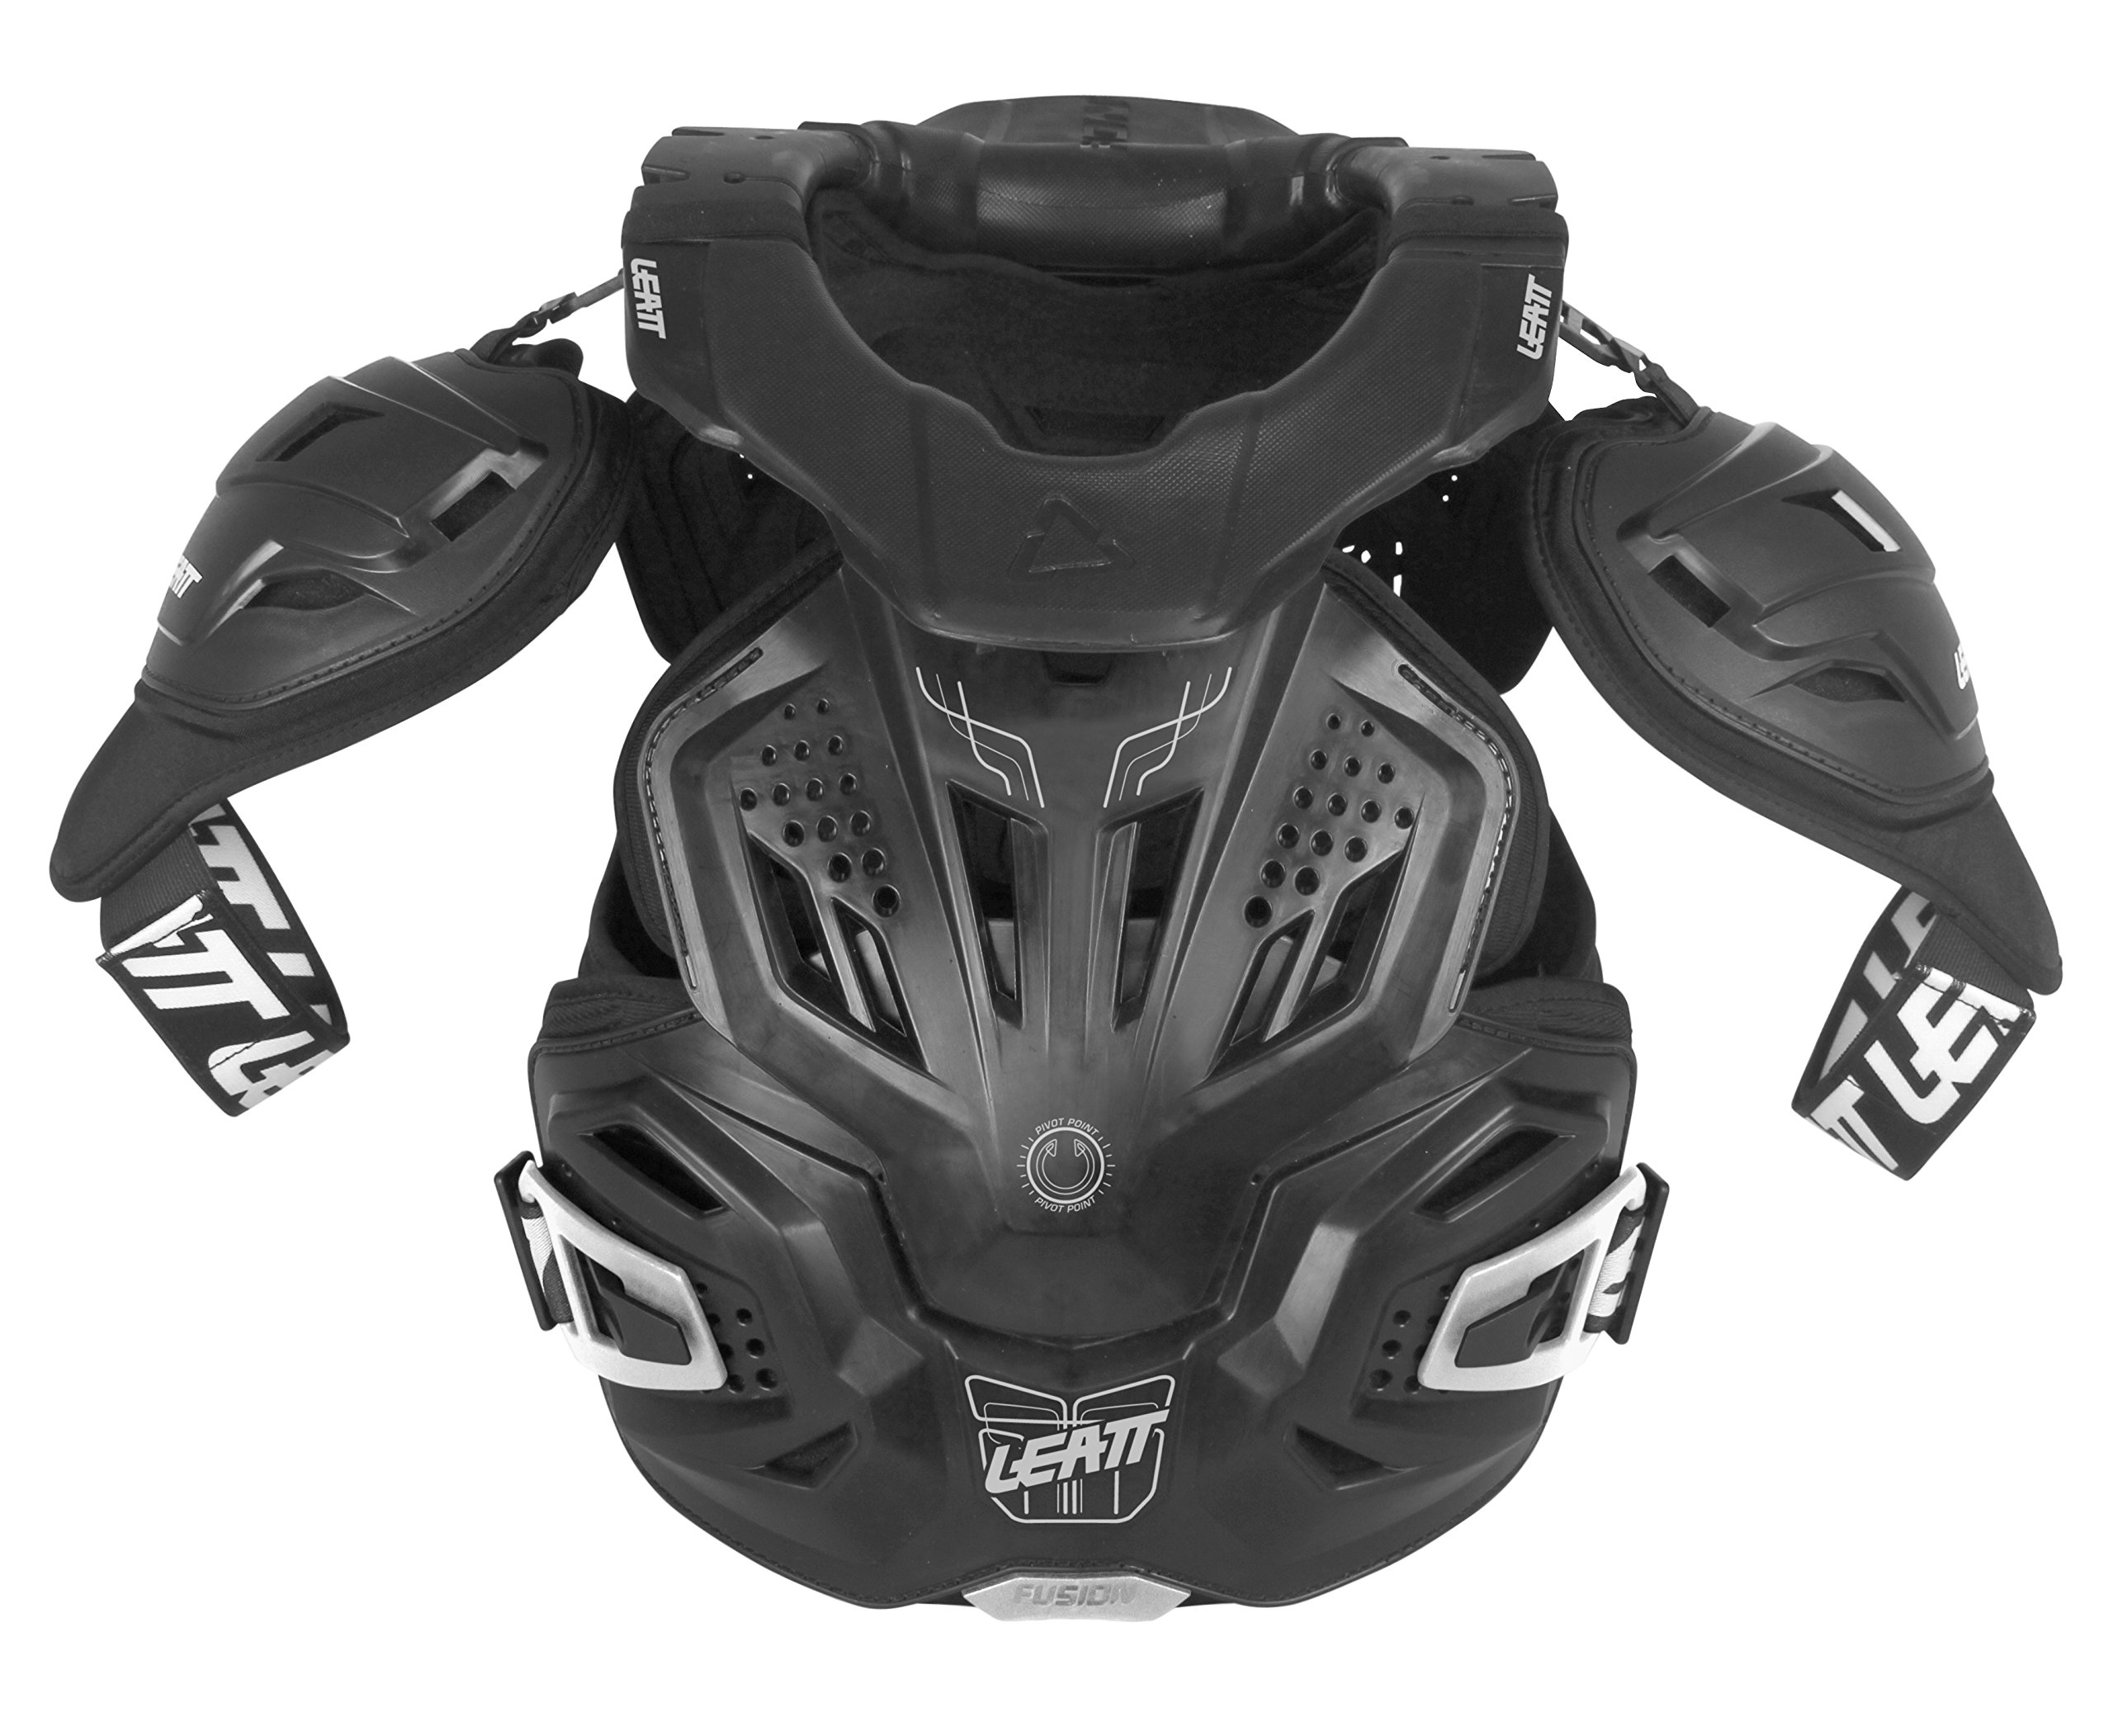 Leatt Fusion 3.0 Vest (Black, Large/X-Large)